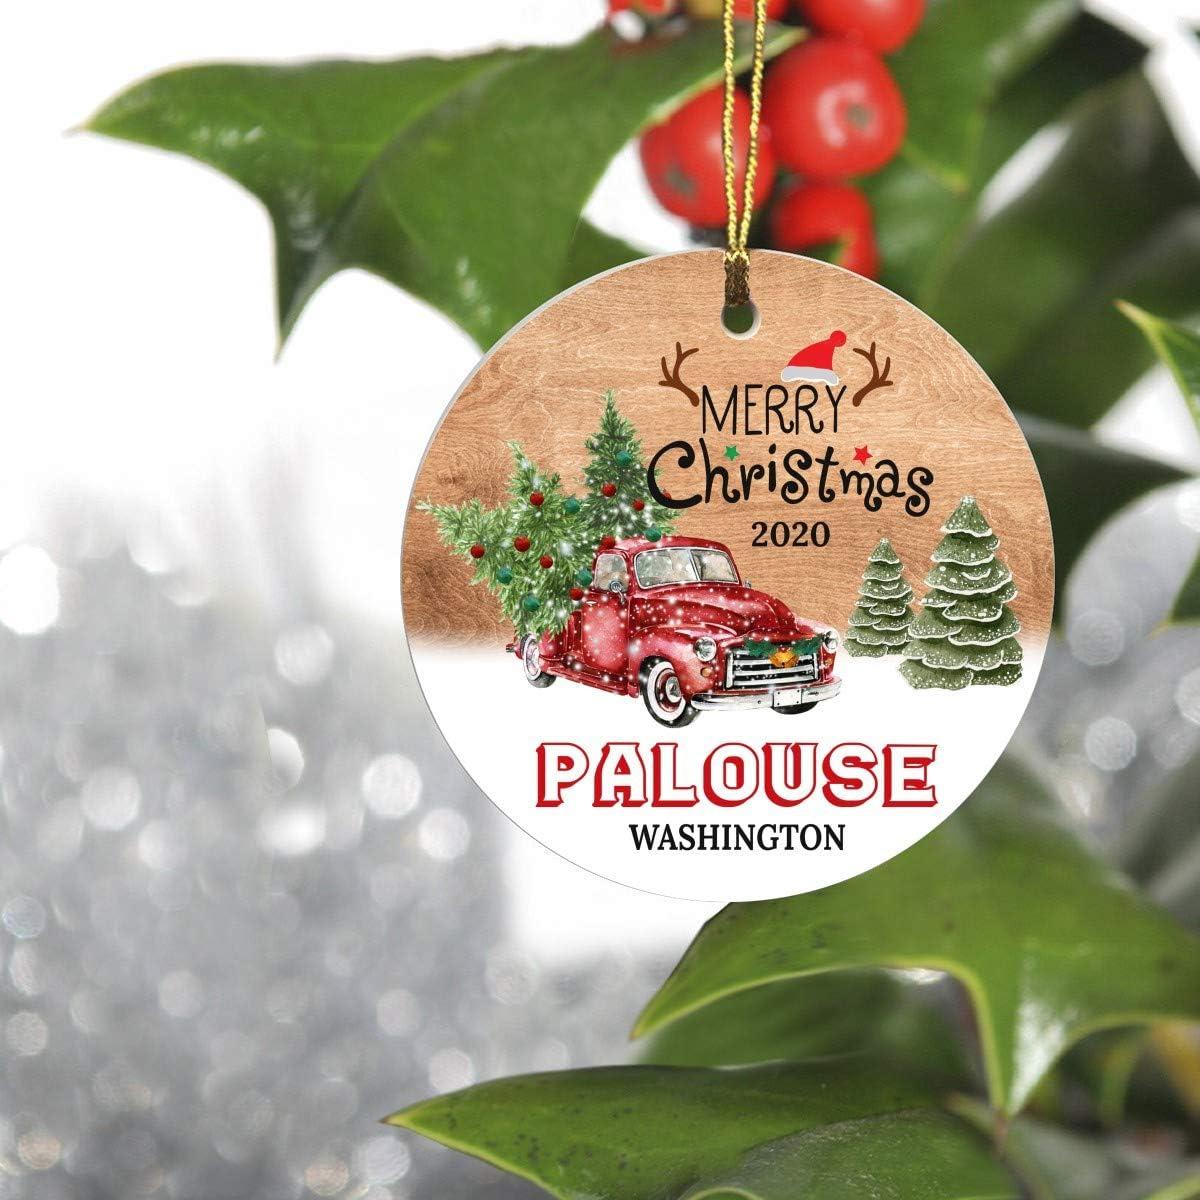 "Merry Christmas Tree Decorations Ornaments 2020 - Ornament Hometown Palouse Washington WA State - Keepsake Gift Ideas Ornament 3"" For Family, Friend And Housewarming"